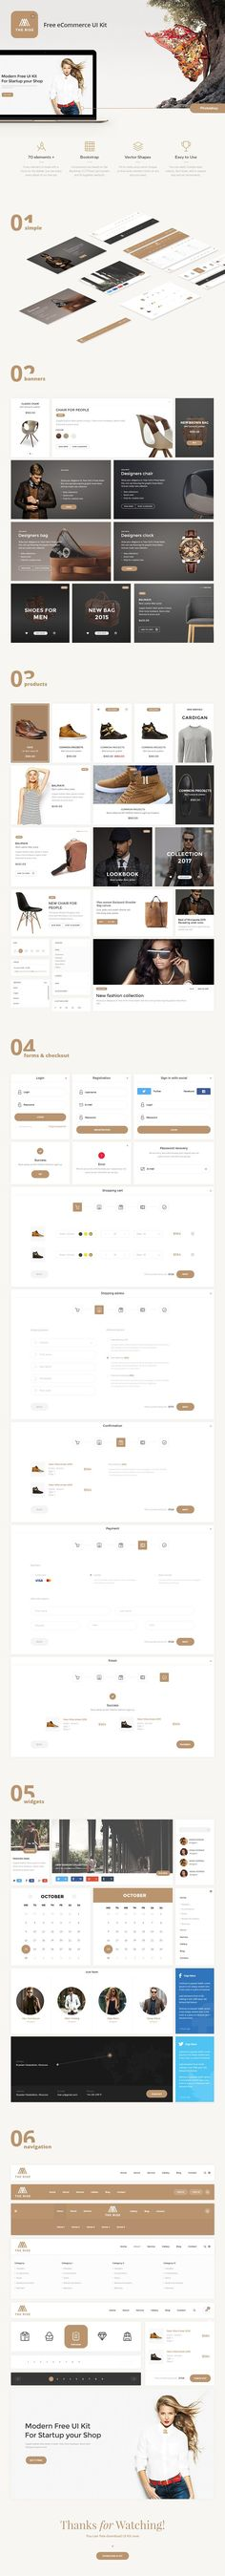 Rise Free eCommerce UI Kit  (Freebie) by Grooni.com